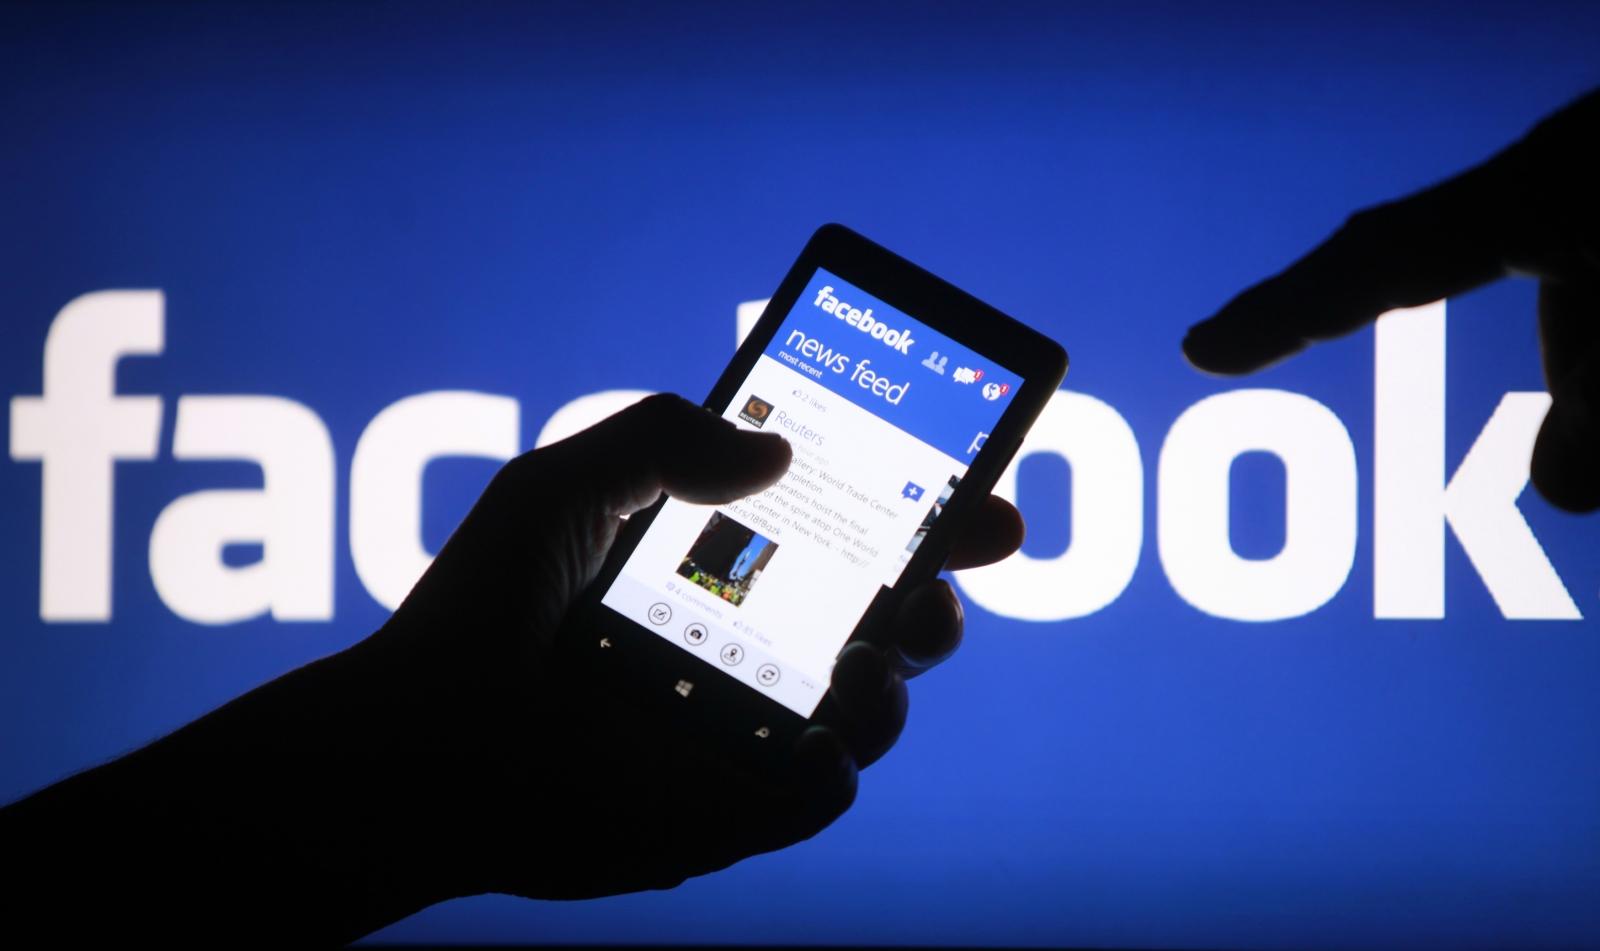 Facebook mobile site down